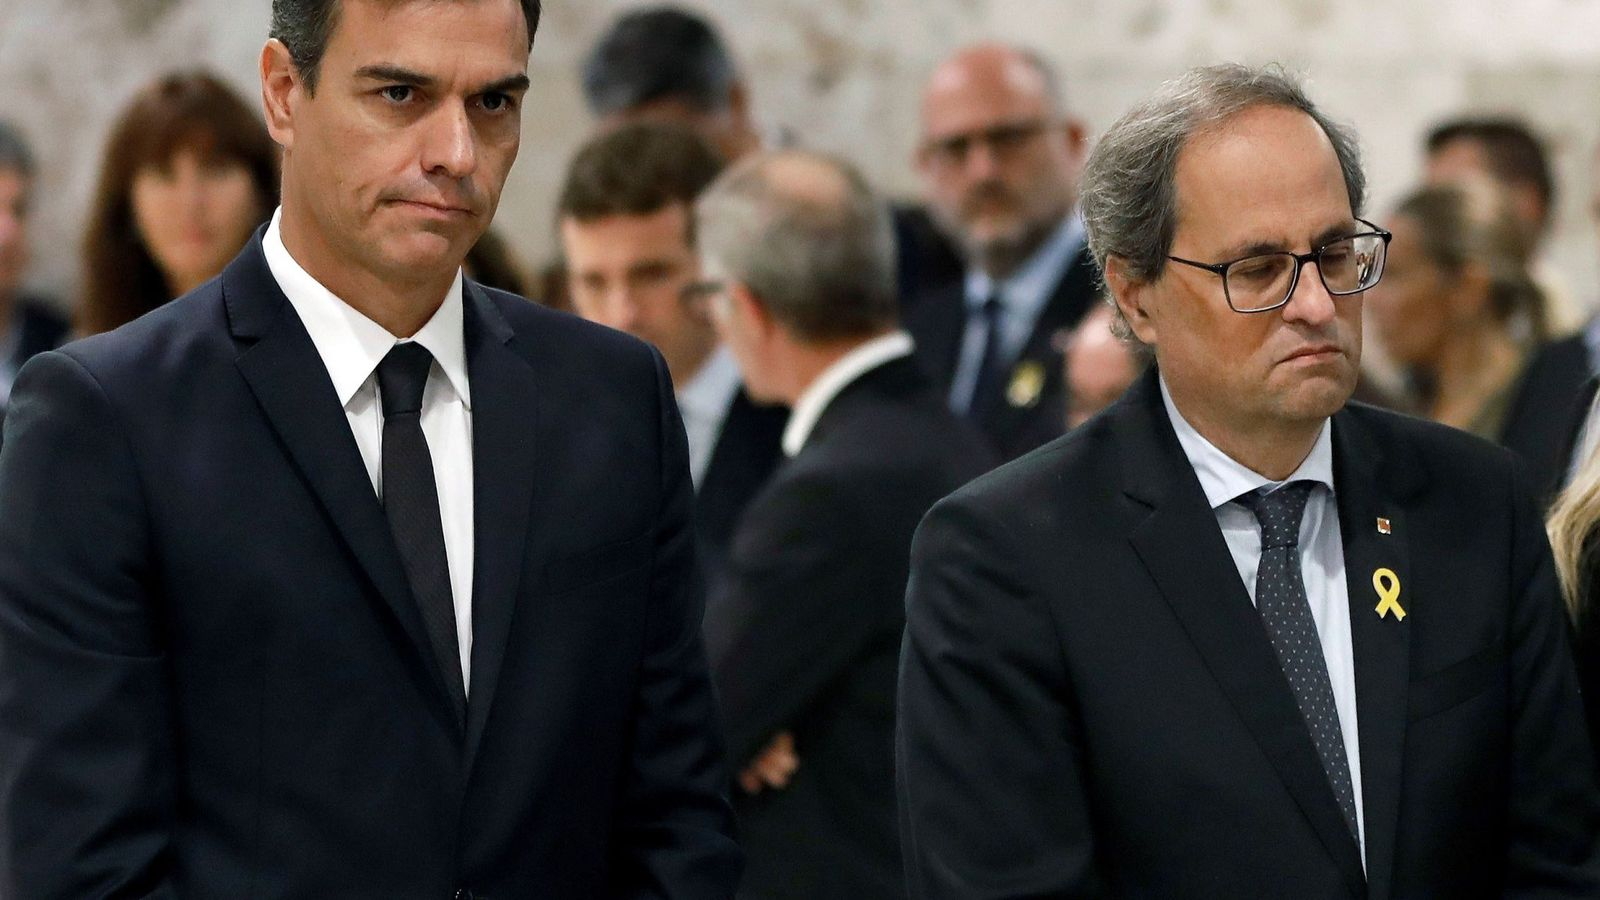 Foto: Pedro Sanchez y el 'president' de la Generalitat, Quim Torra, el pasado 8 de octubre en el funeral de Montserrat Caballé en Barcelona. (EFE)